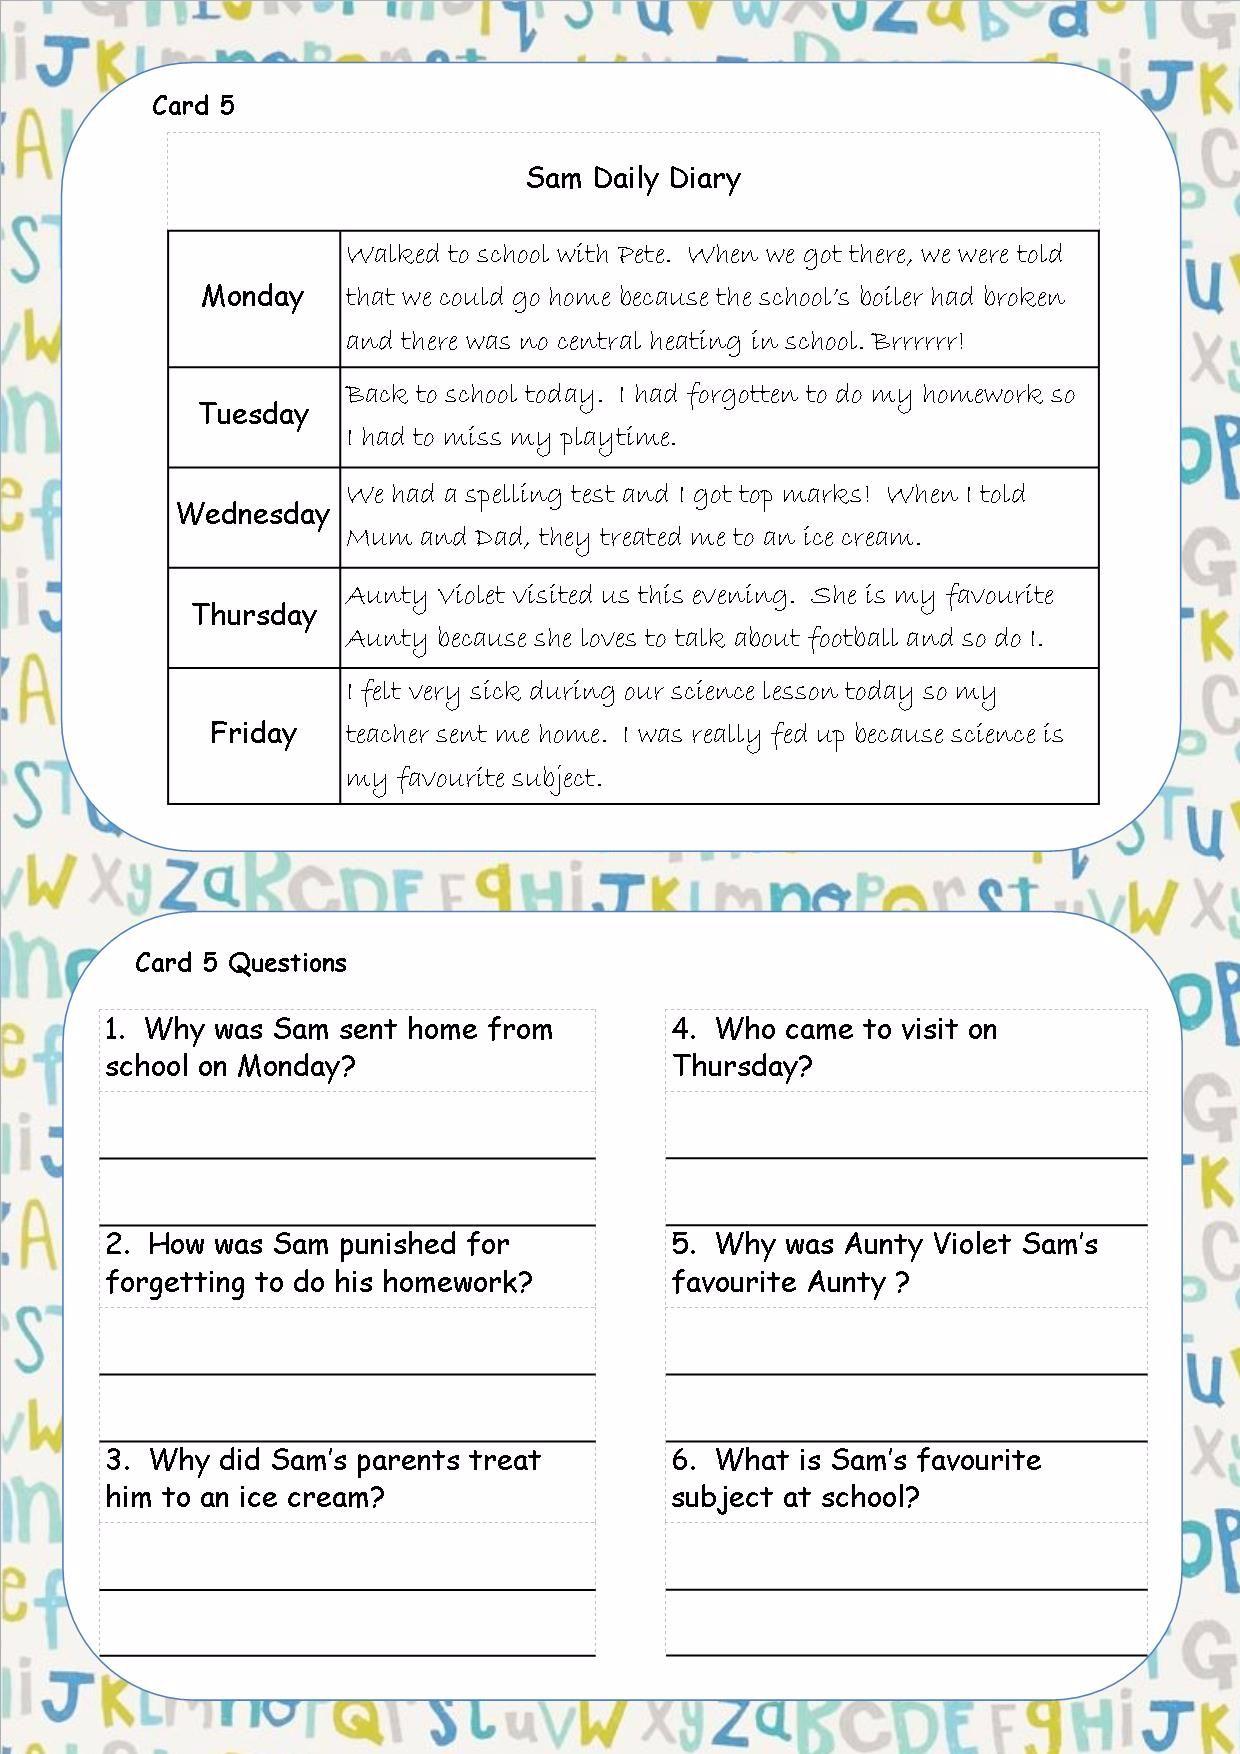 Worksheet Interactive Reading Comprehension Ks2 ks1 ks2 sen ipc reading comprehension cards guided cards5